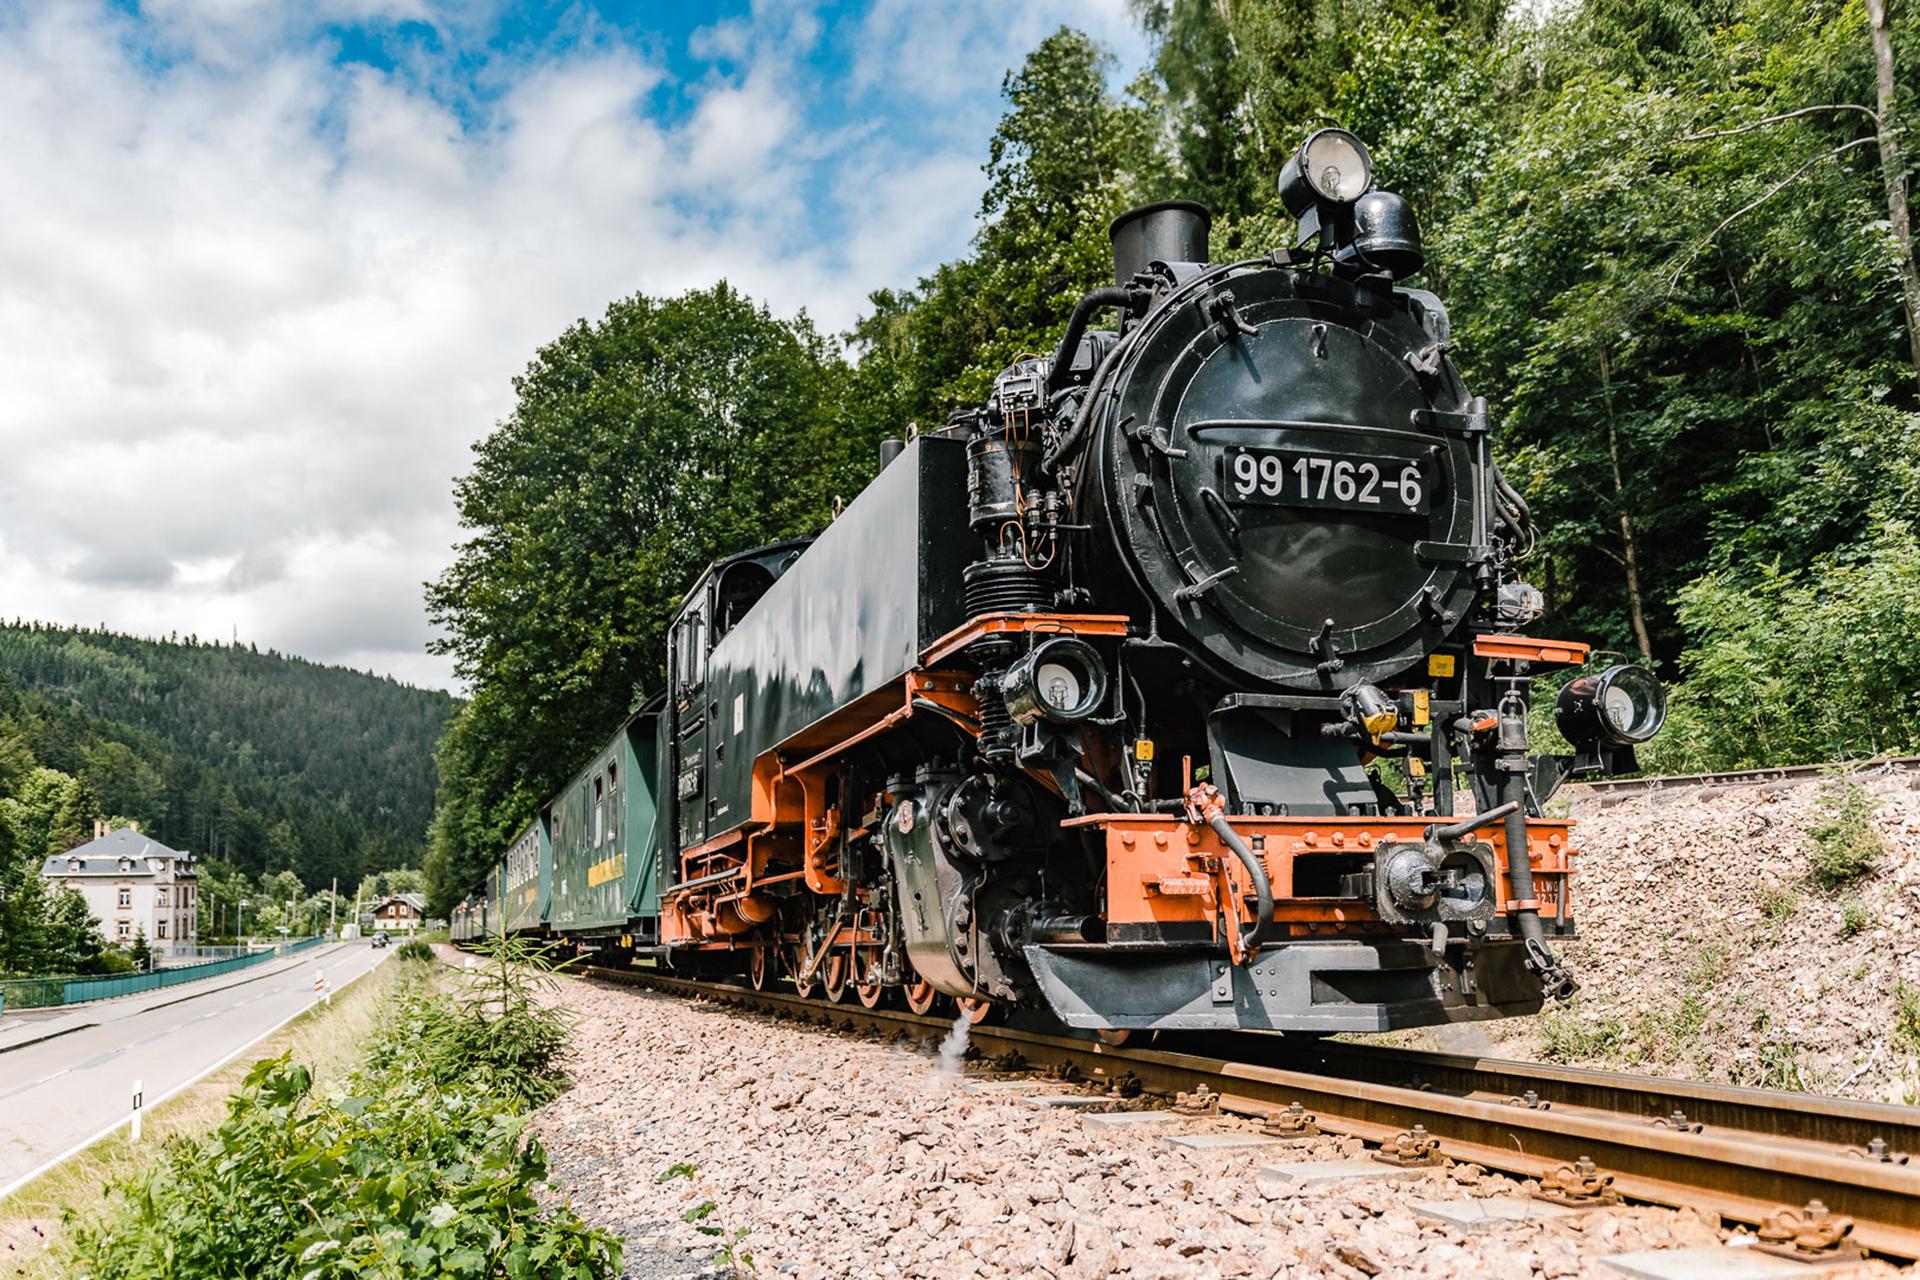 2020.07 - Altenberg, Bärenfels, Kipsdorf, Schellerhau_0705_2271_web74